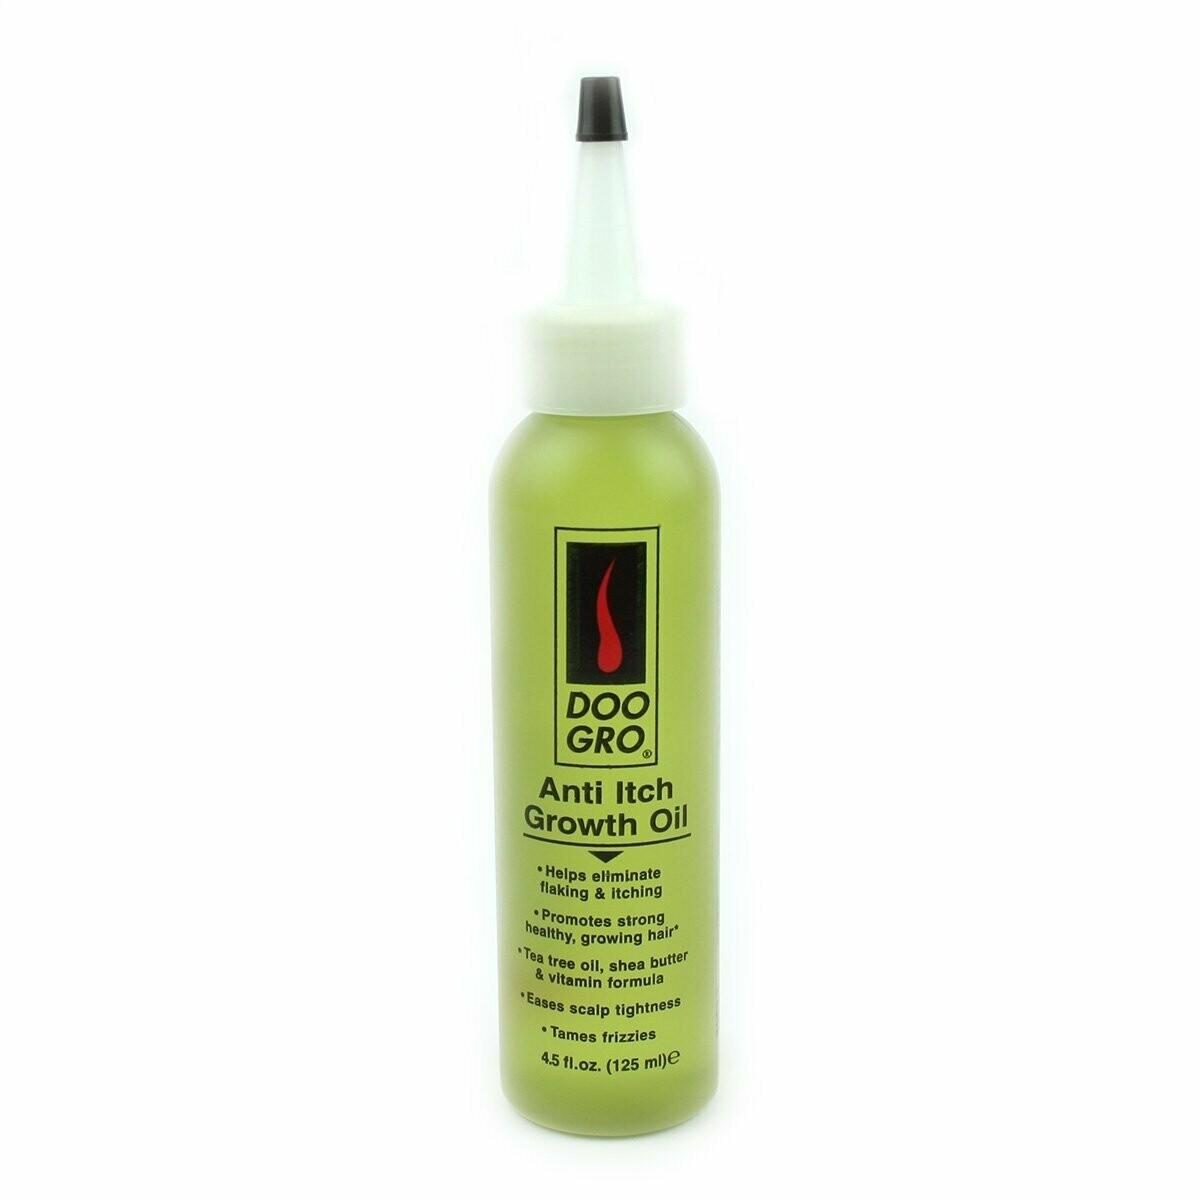 Doo Grow Anti Itch Growth Oil